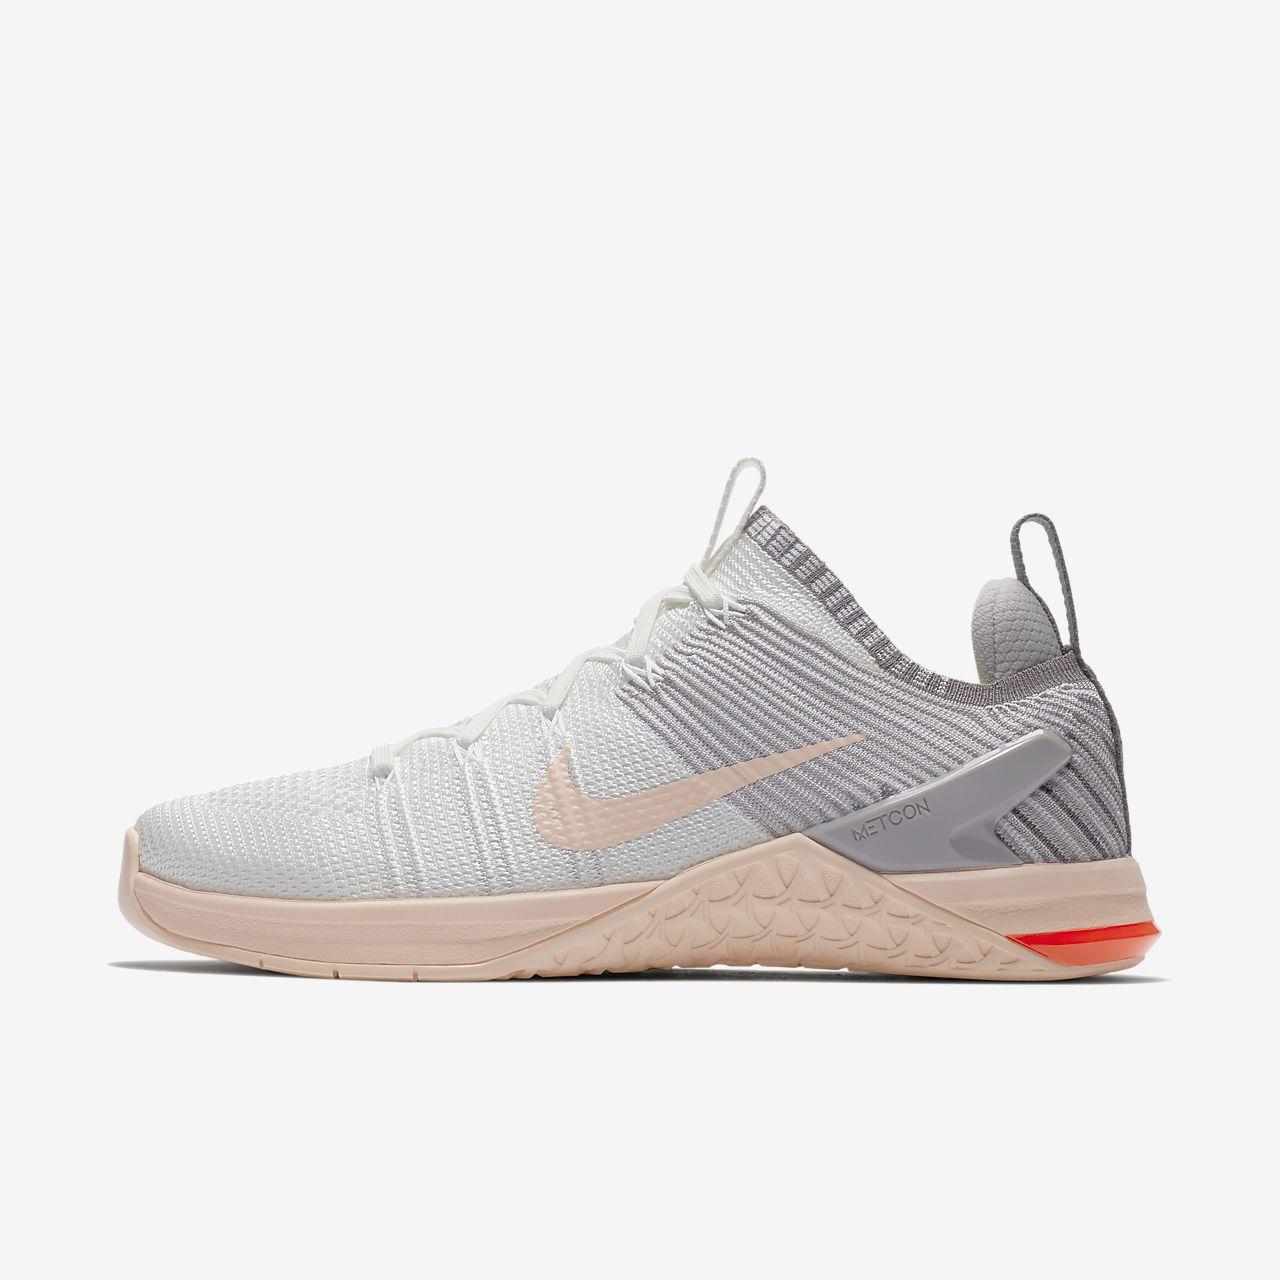 Nike Wmns Metcon DSX Flyknit 2 Women White Crimson Tint Sneakers 924595-102